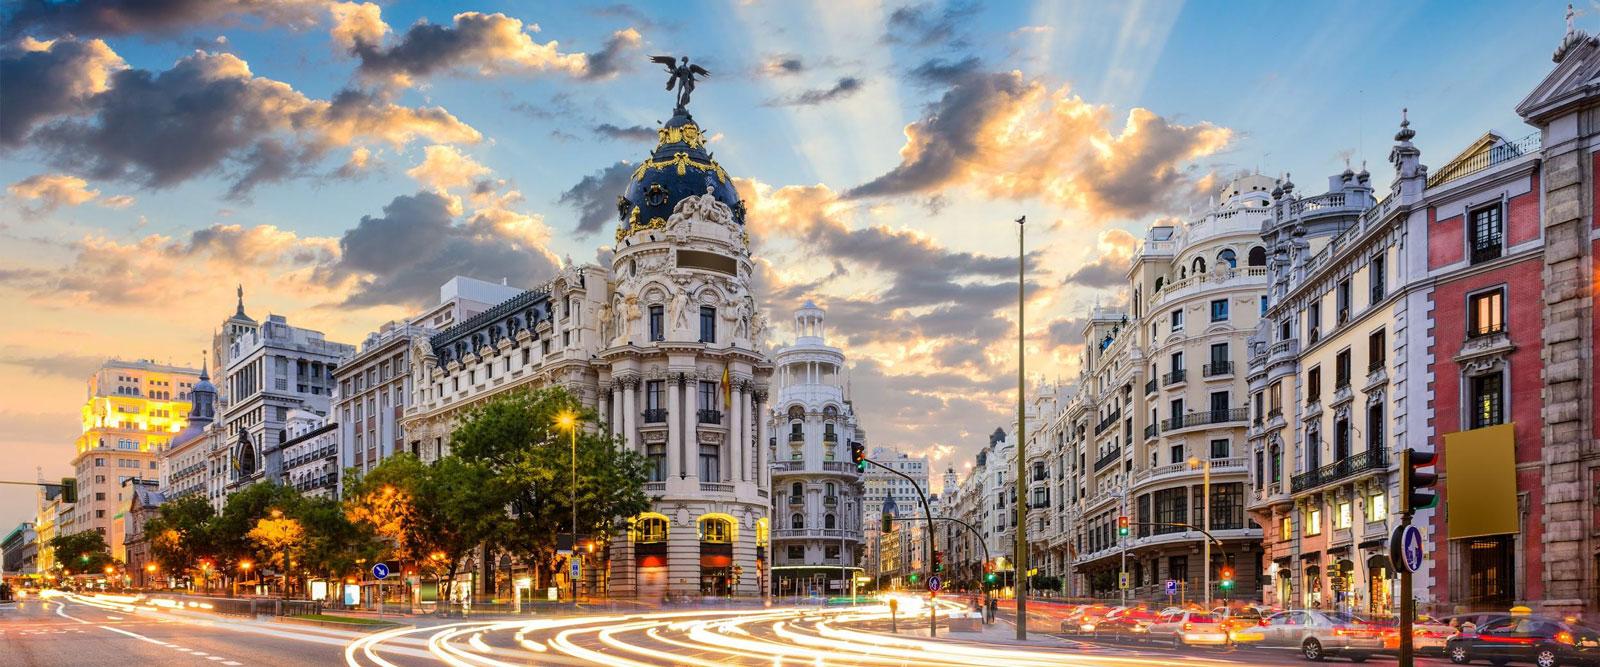 MPTC Spain 2023